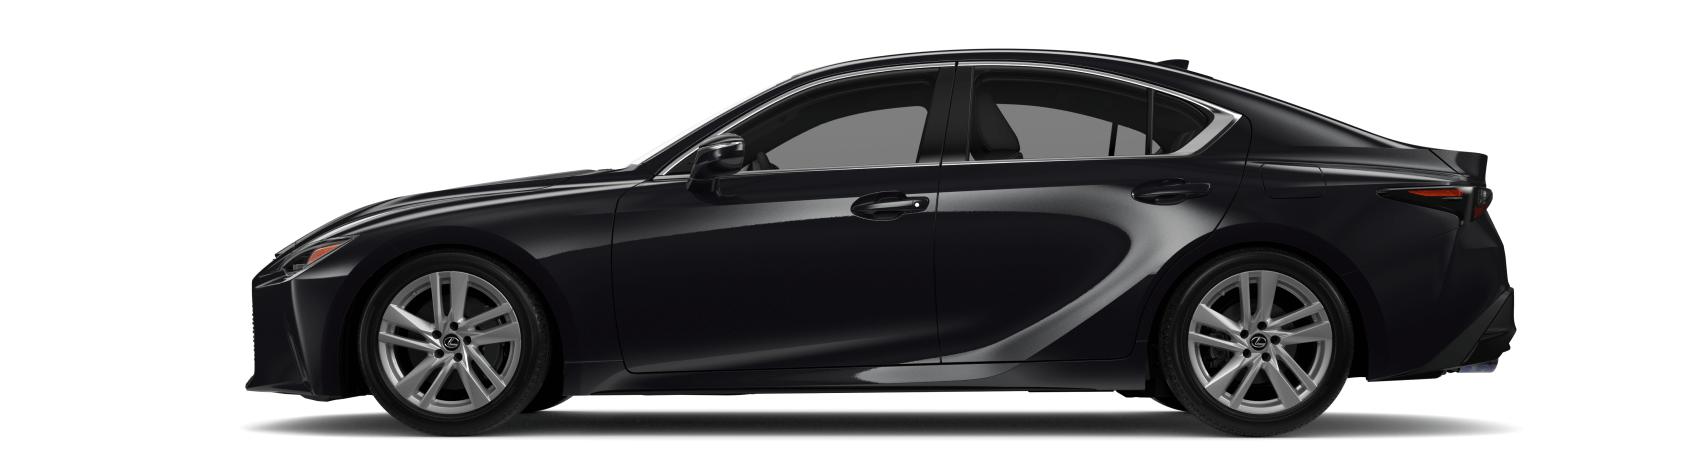 2021 Lexus IS 300 Black